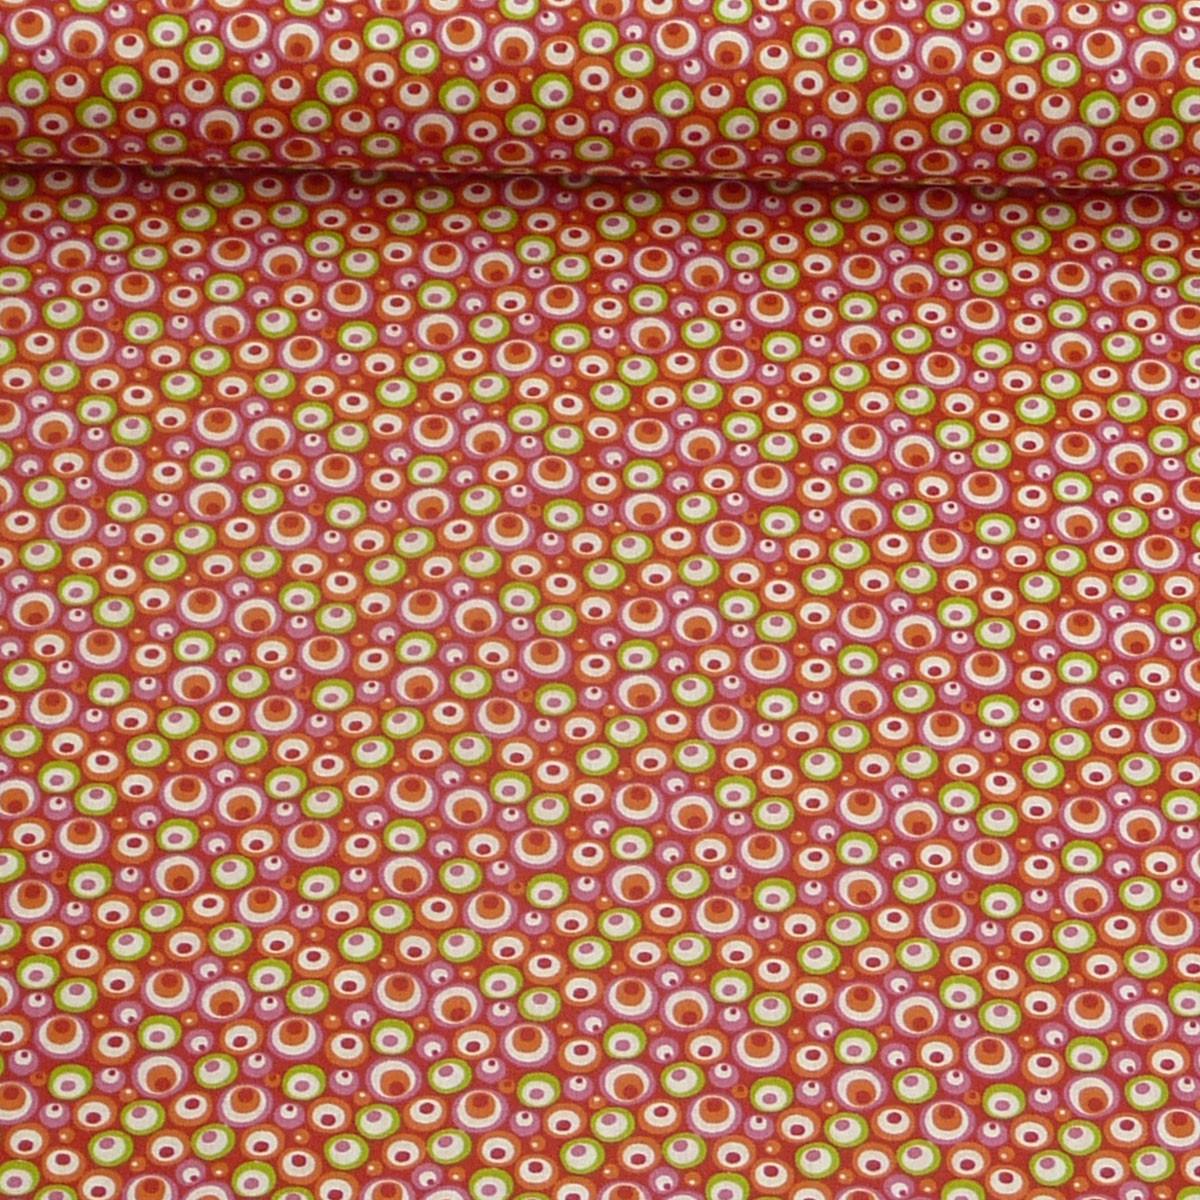 baumwollstoff stoff meterware kreise rot gr n rosa orange wei 1 6m breite alle stoffe stoffe. Black Bedroom Furniture Sets. Home Design Ideas